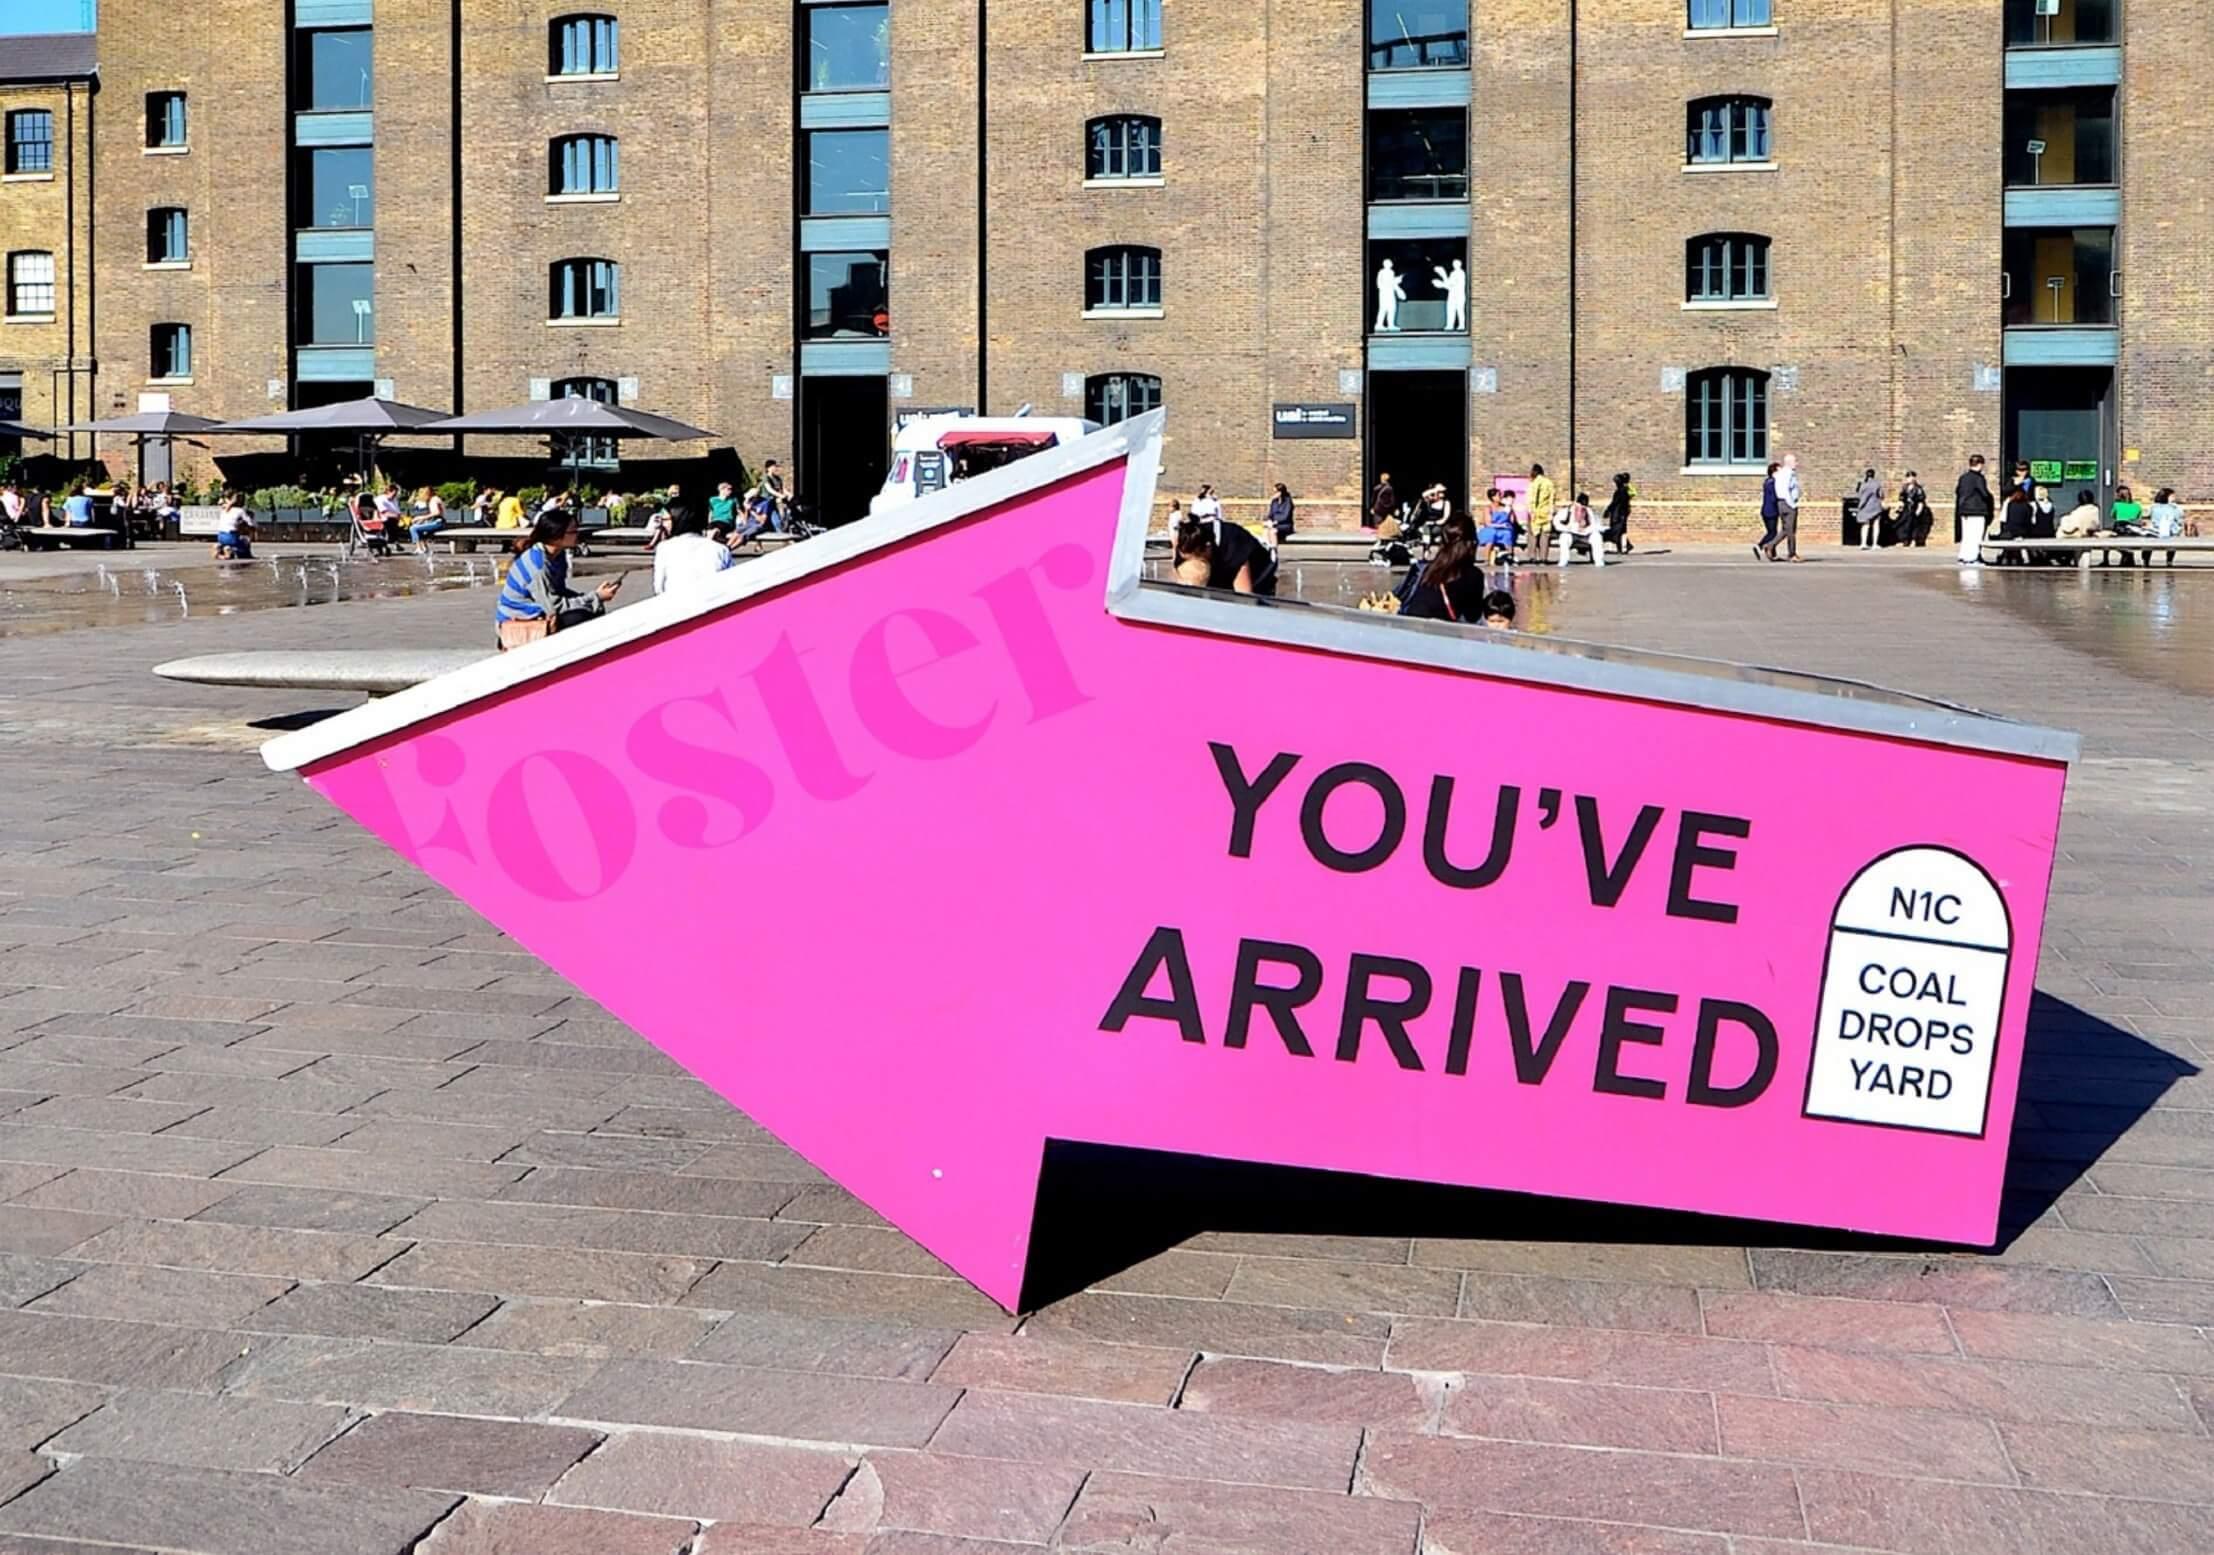 Destination Sign in Pink